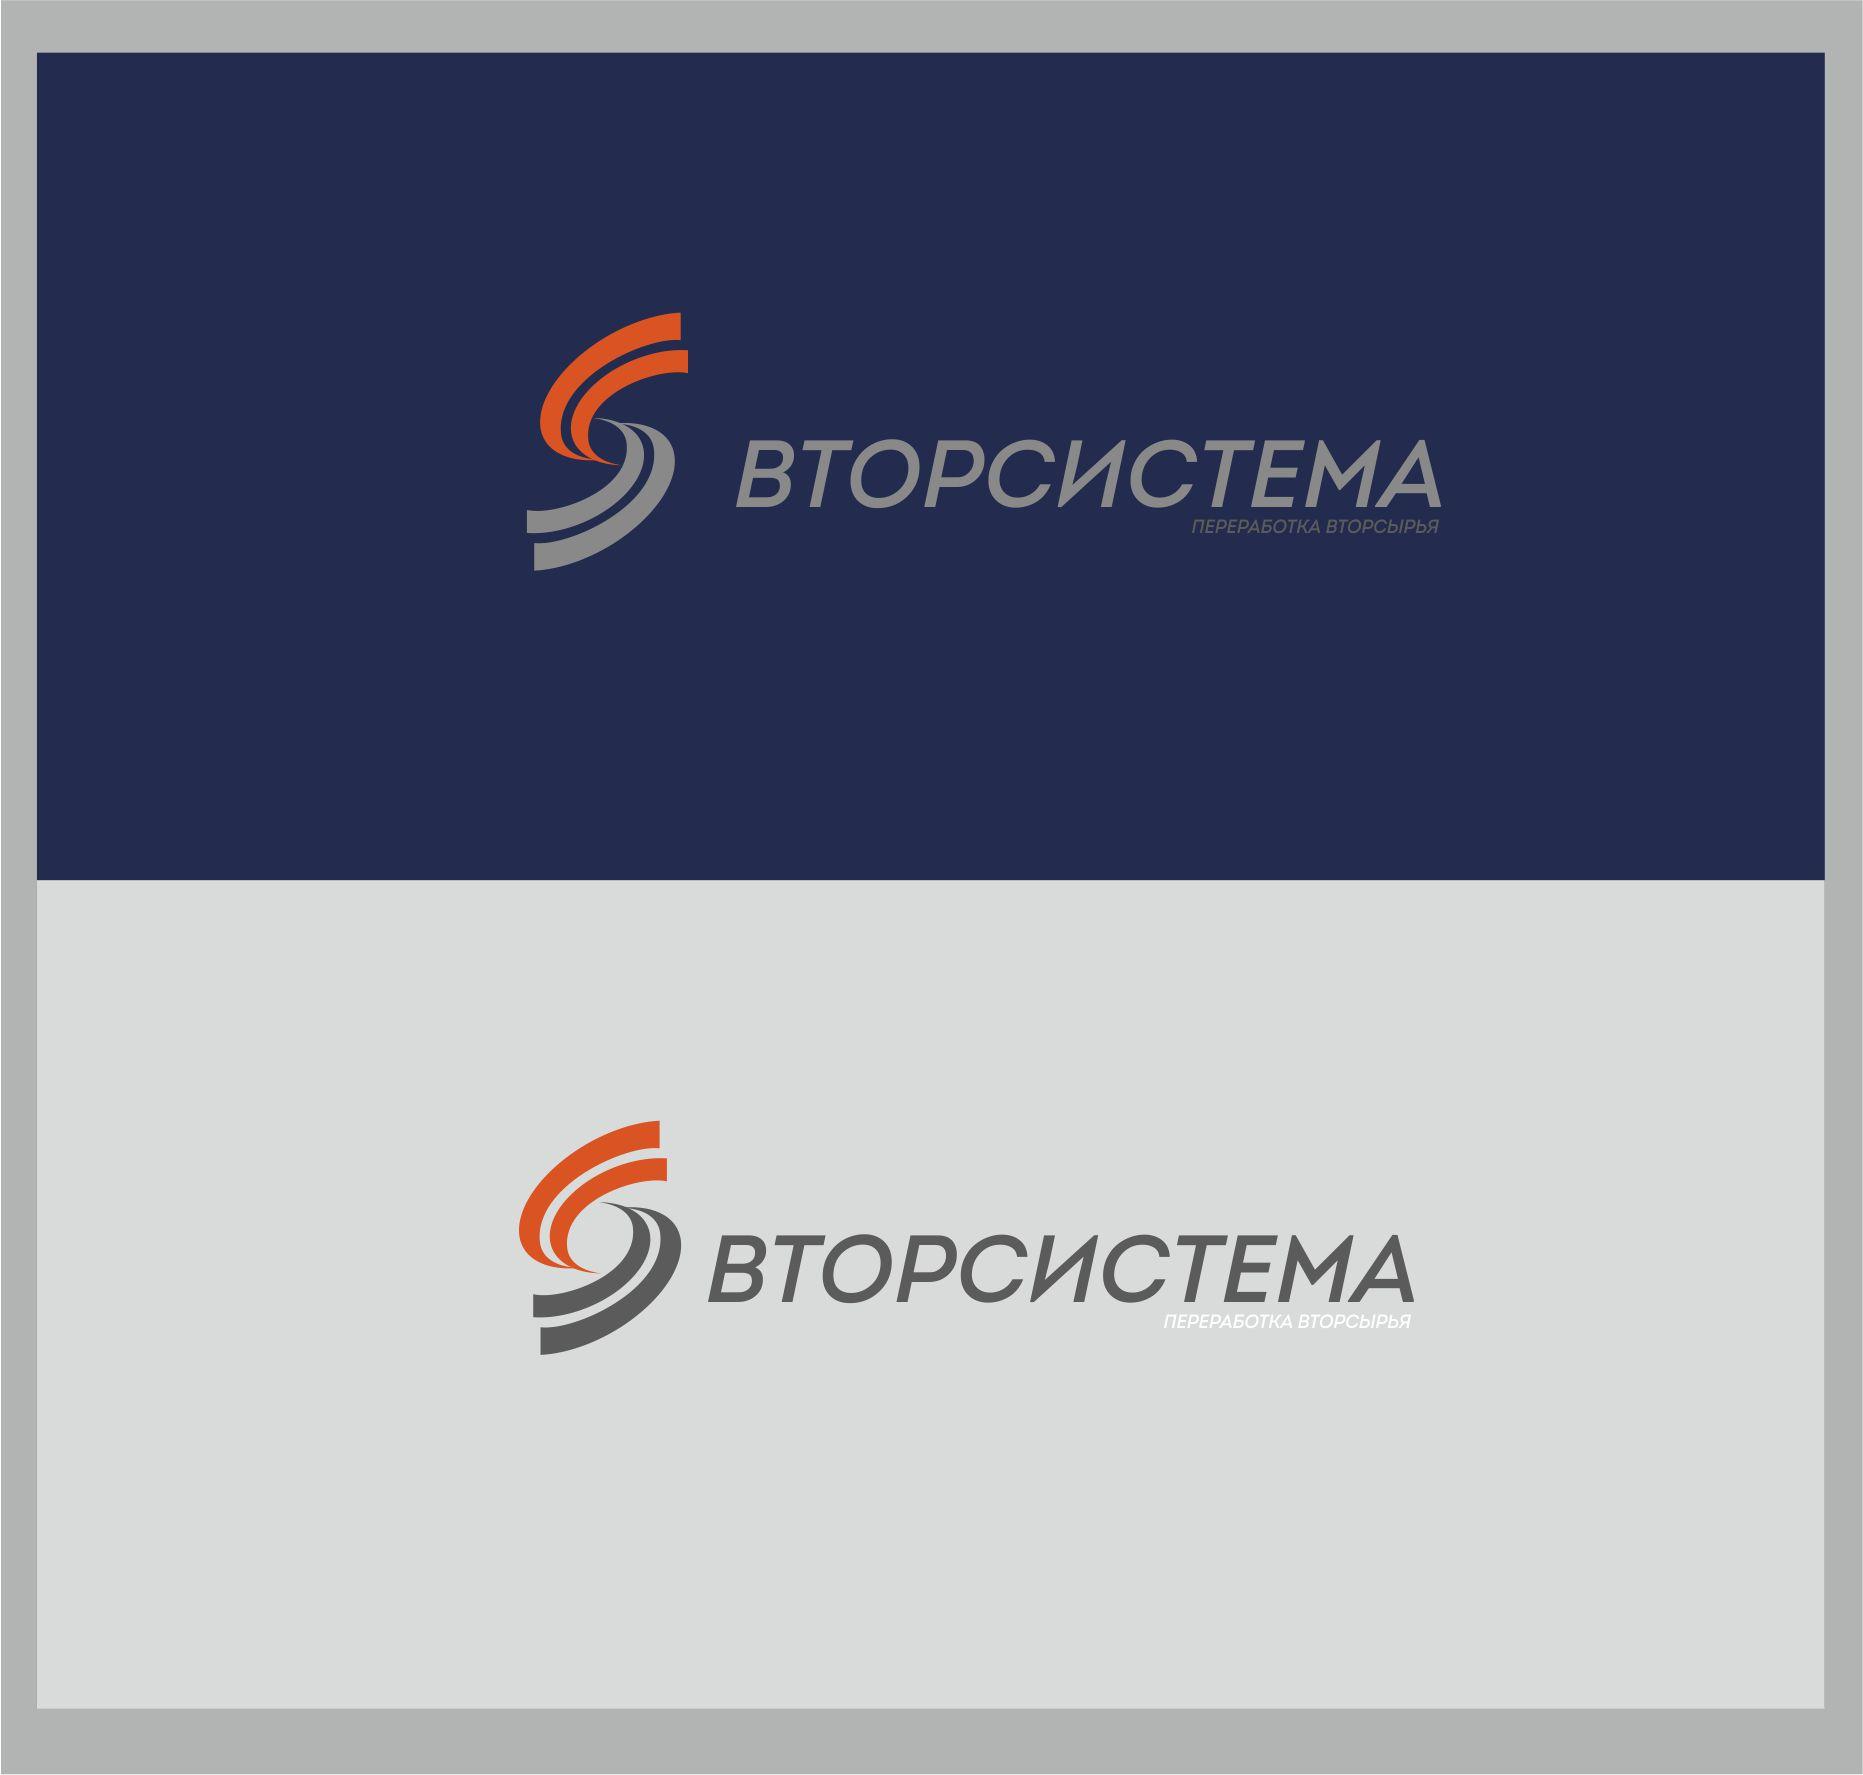 Нужно разработать логотип и дизайн визитки фото f_654554fc785ed550.jpg